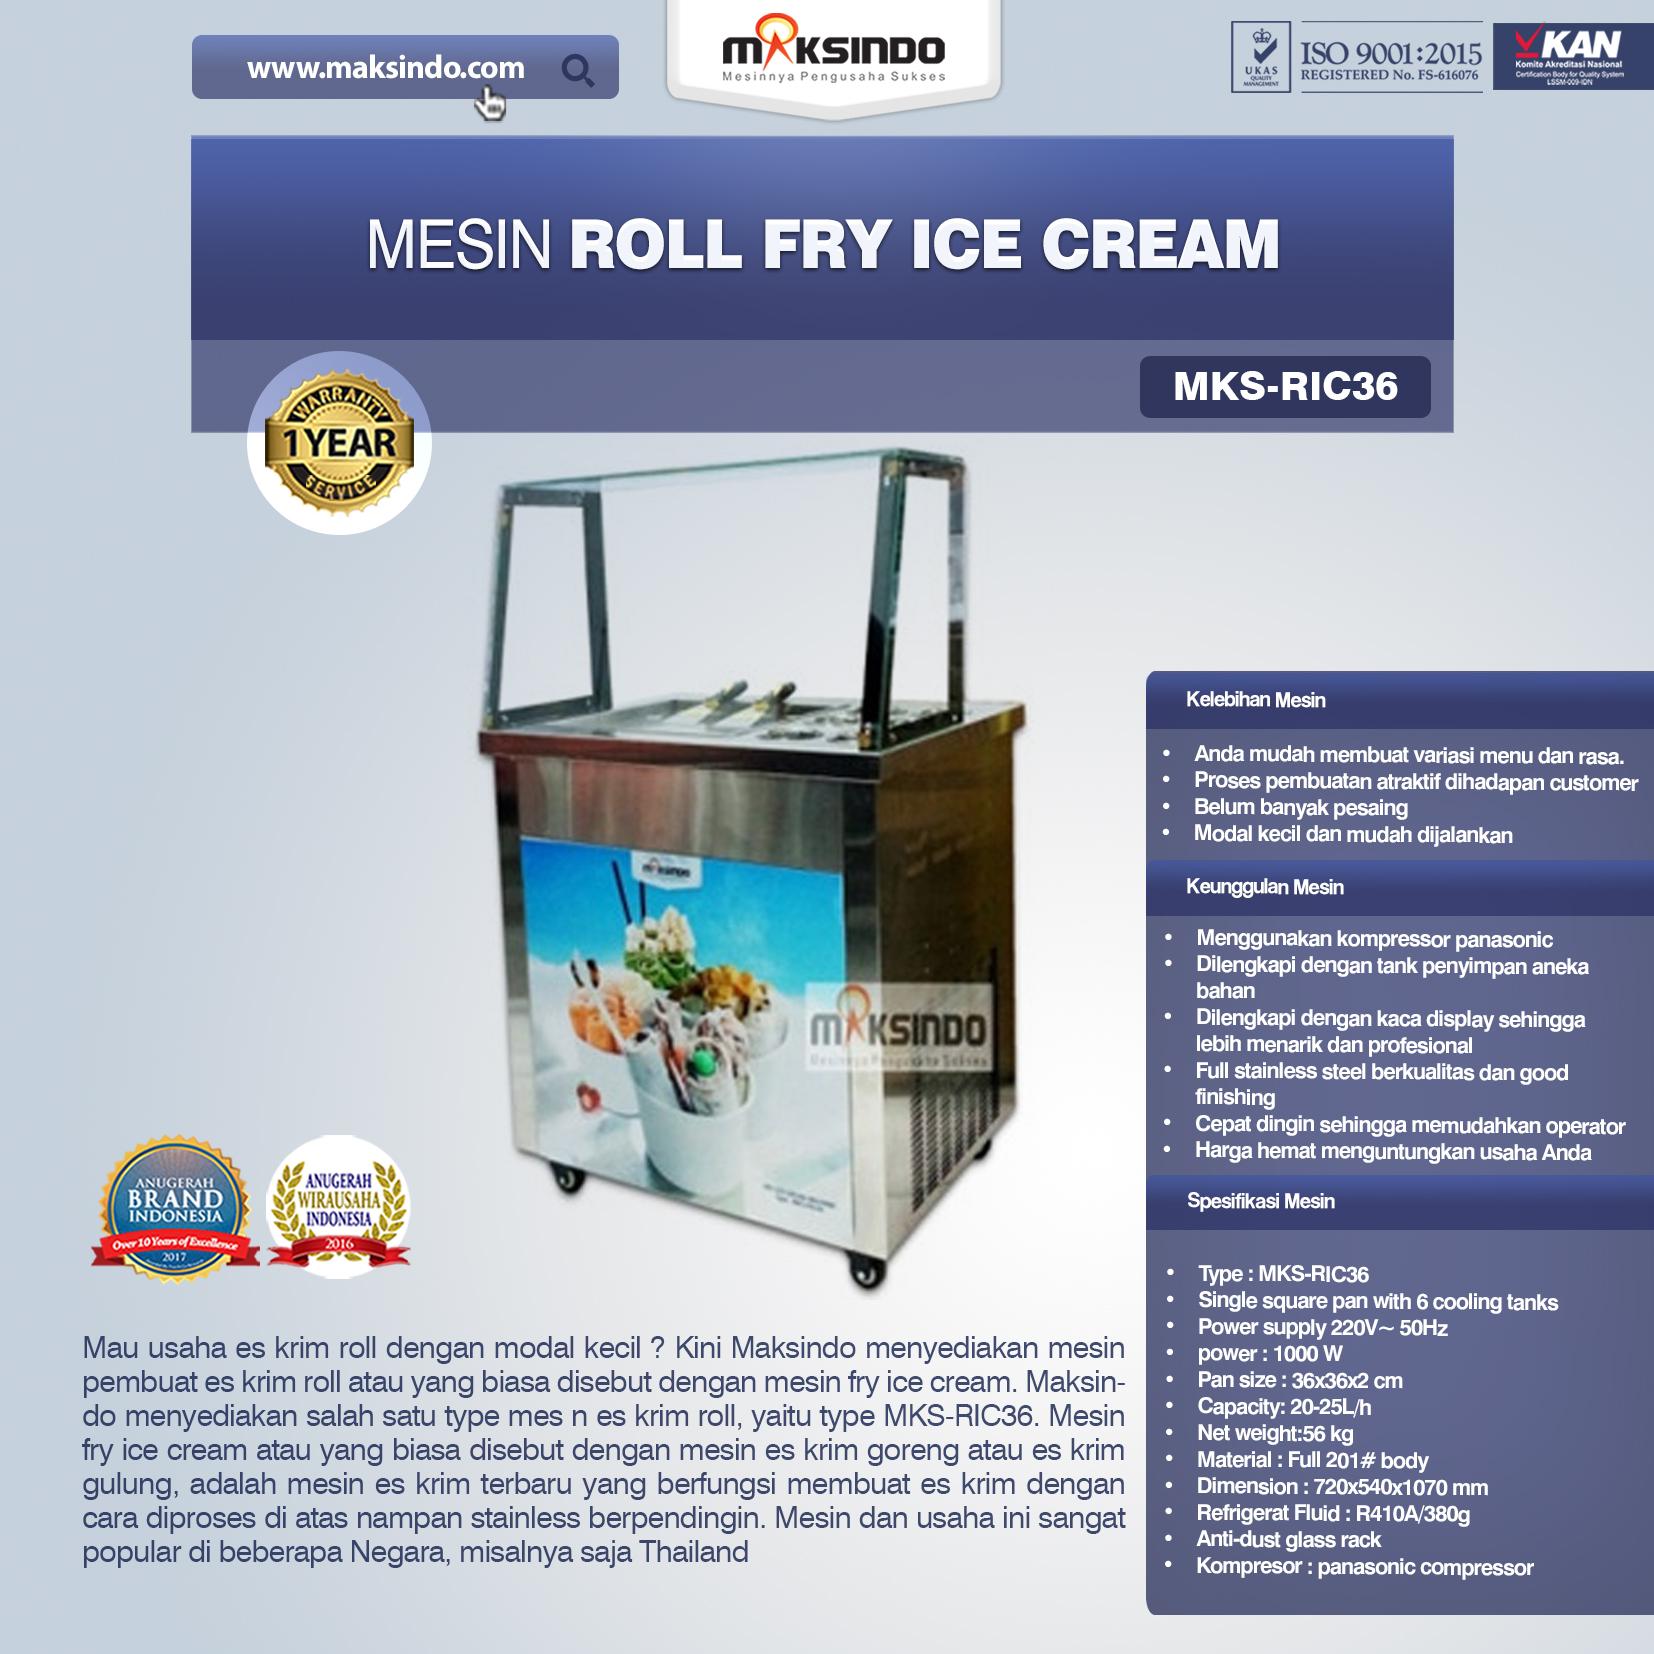 Jual Mesin Roll Fry Ice Cream (RIC36) di Bali